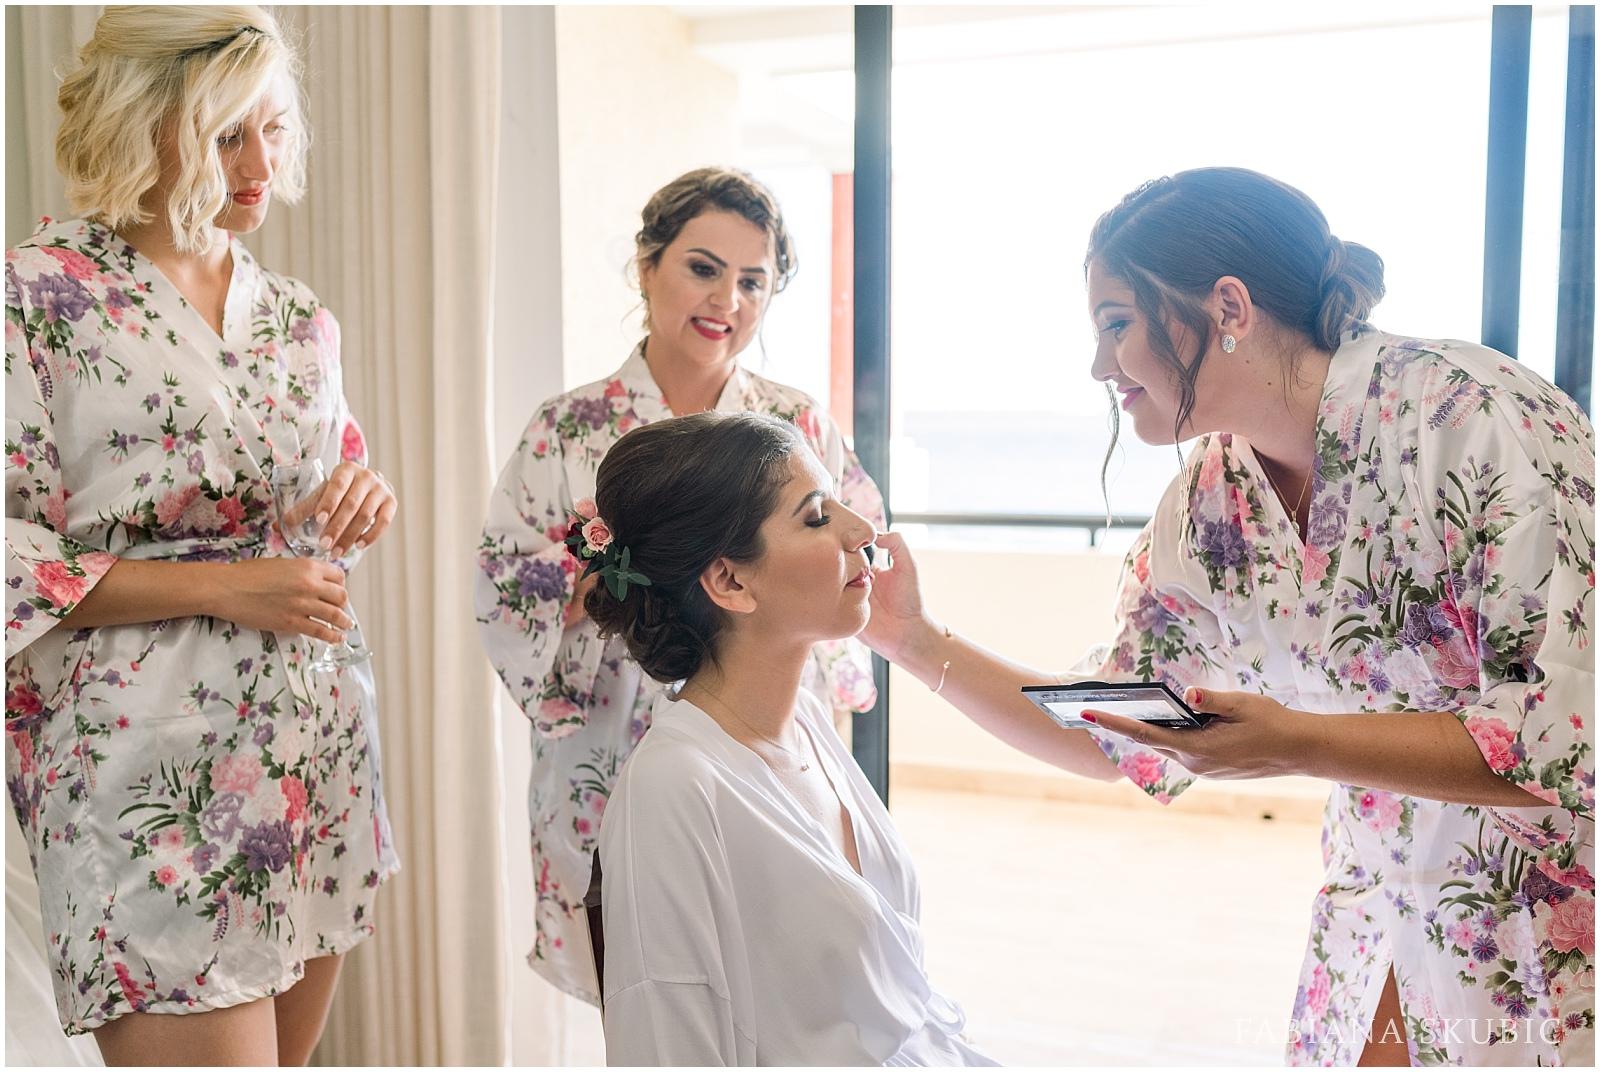 TJ_Now_Sapphire_Riviera_Cancun_Mexico_Wedding_Photos_0161.jpg